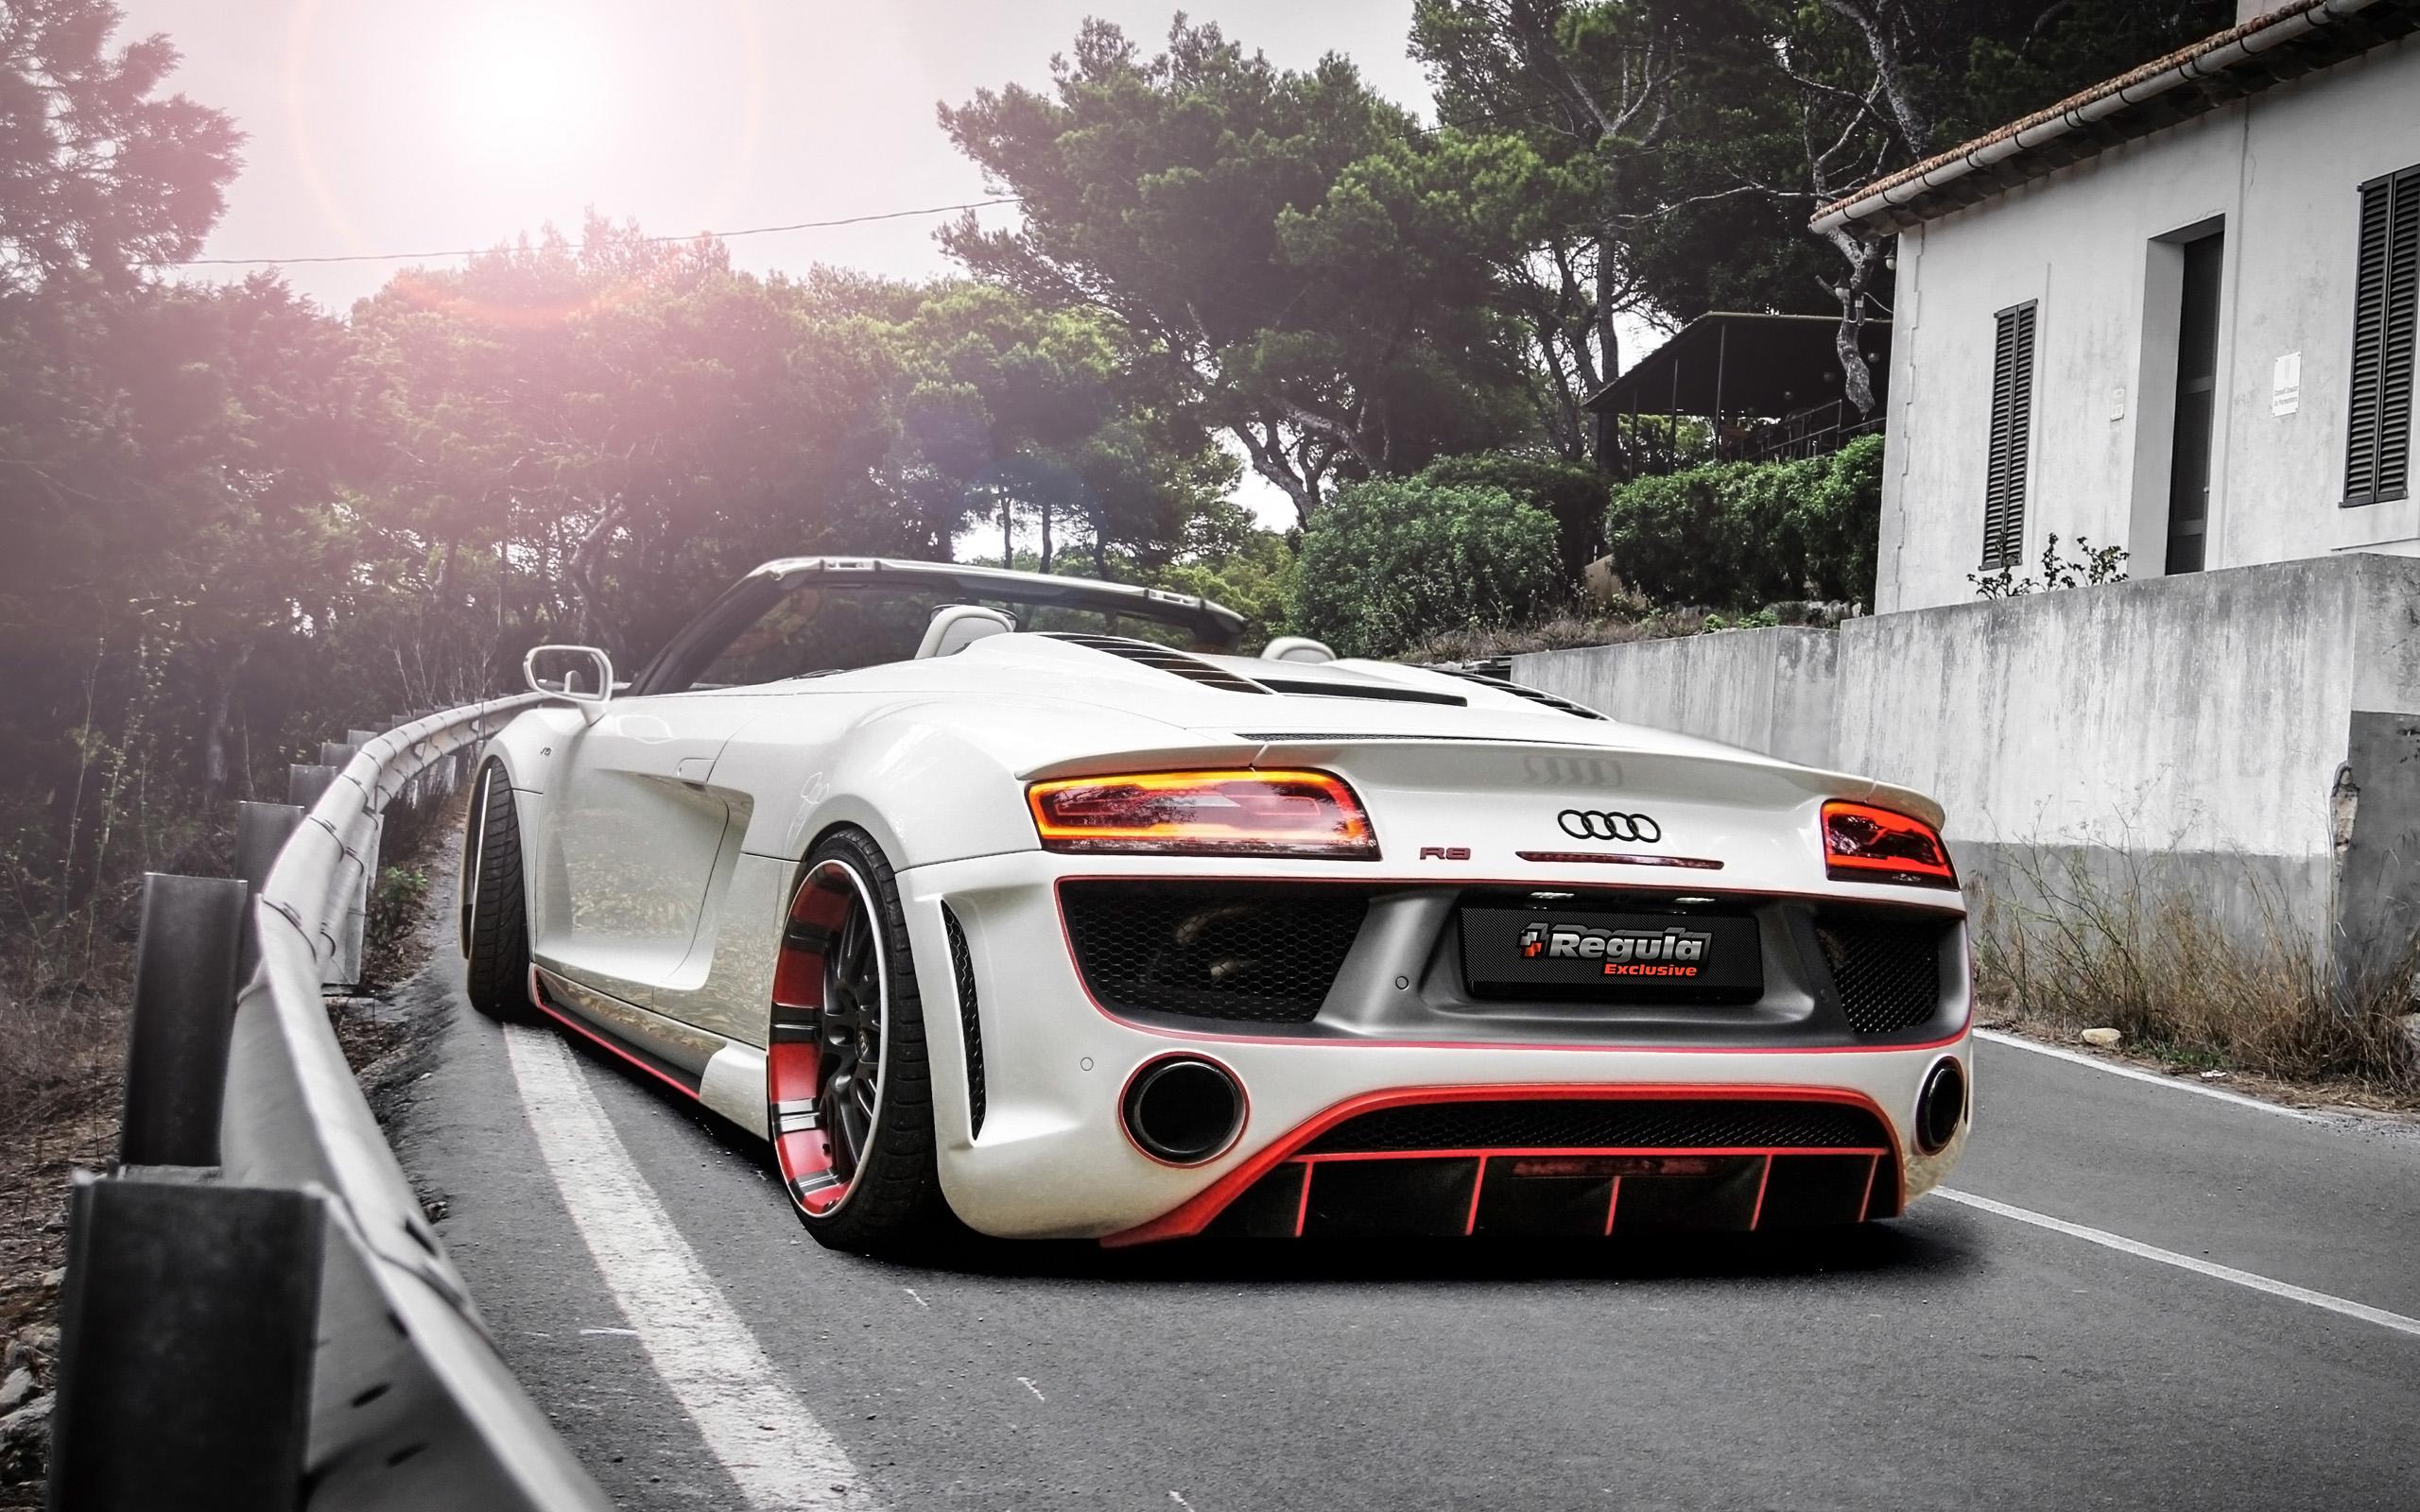 Audi R8 V10 Spyder By Regula Tuning 2 Wallpaper HD Car Wallpapers 2560x1600